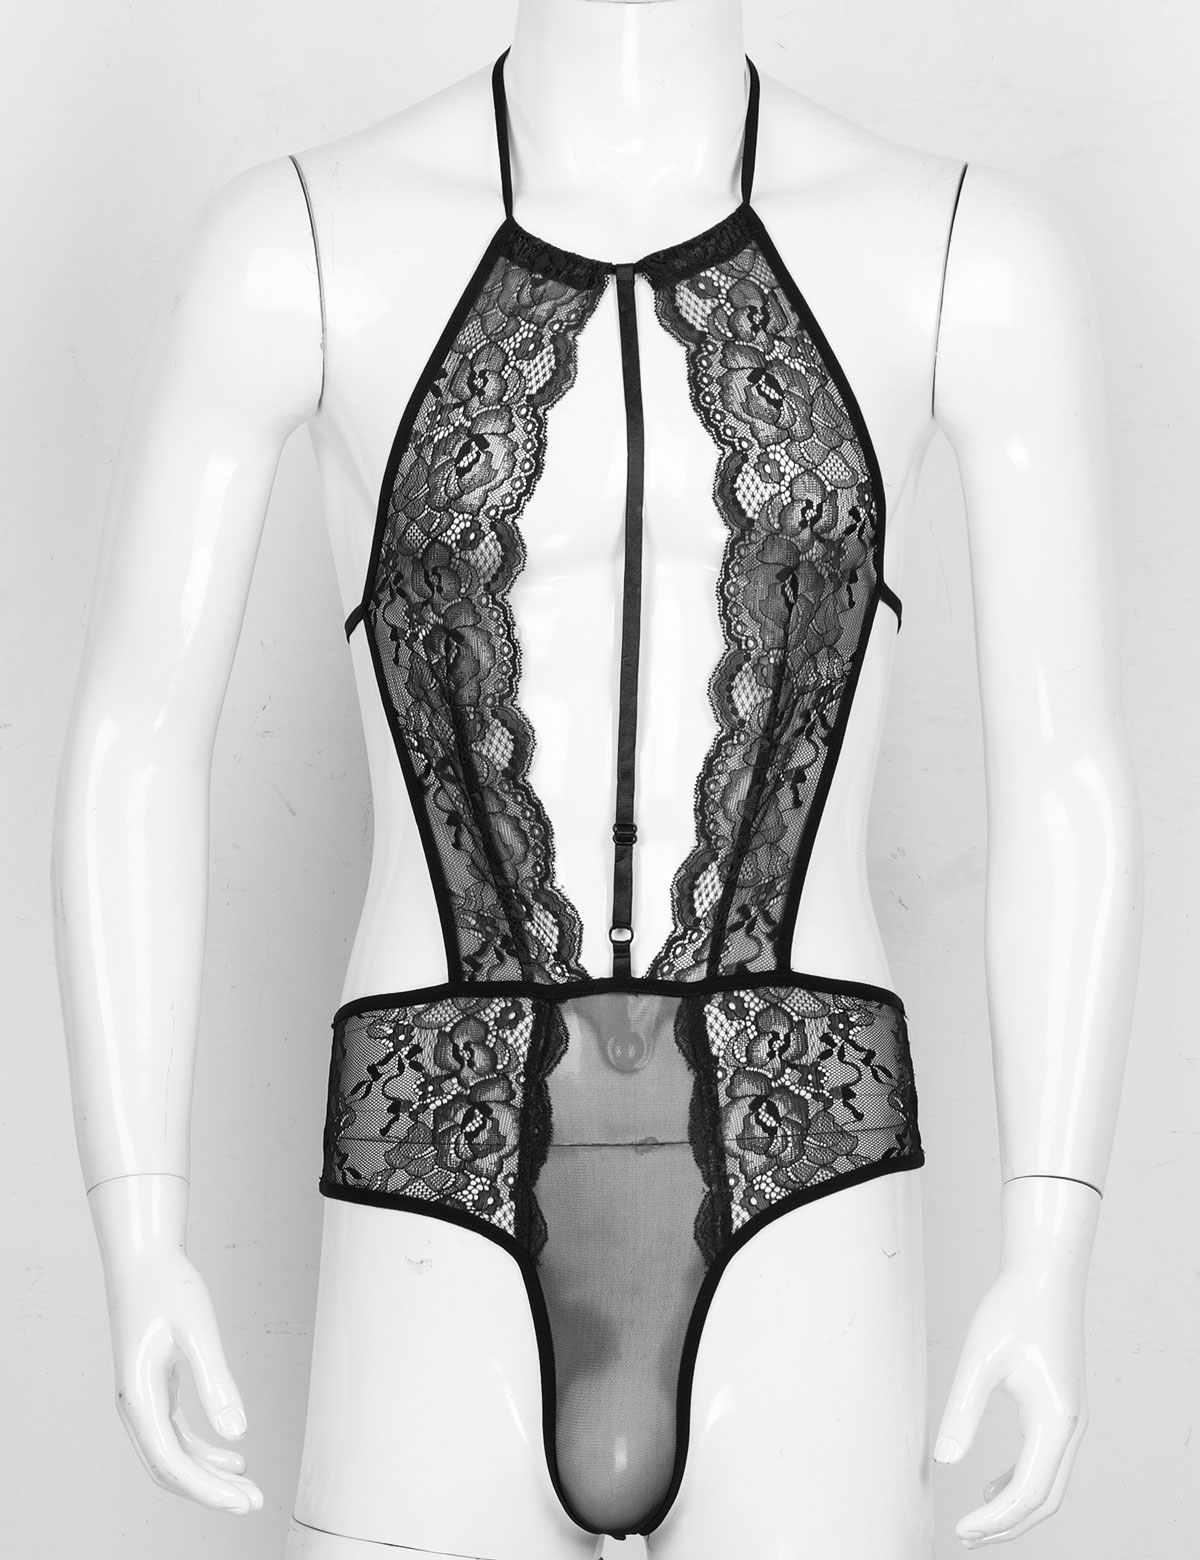 CHICTRY Mens Adult Fishnet Sissy Lingerie One-Piece Nightwear Skirted Leotard Bodysuit Pajamas